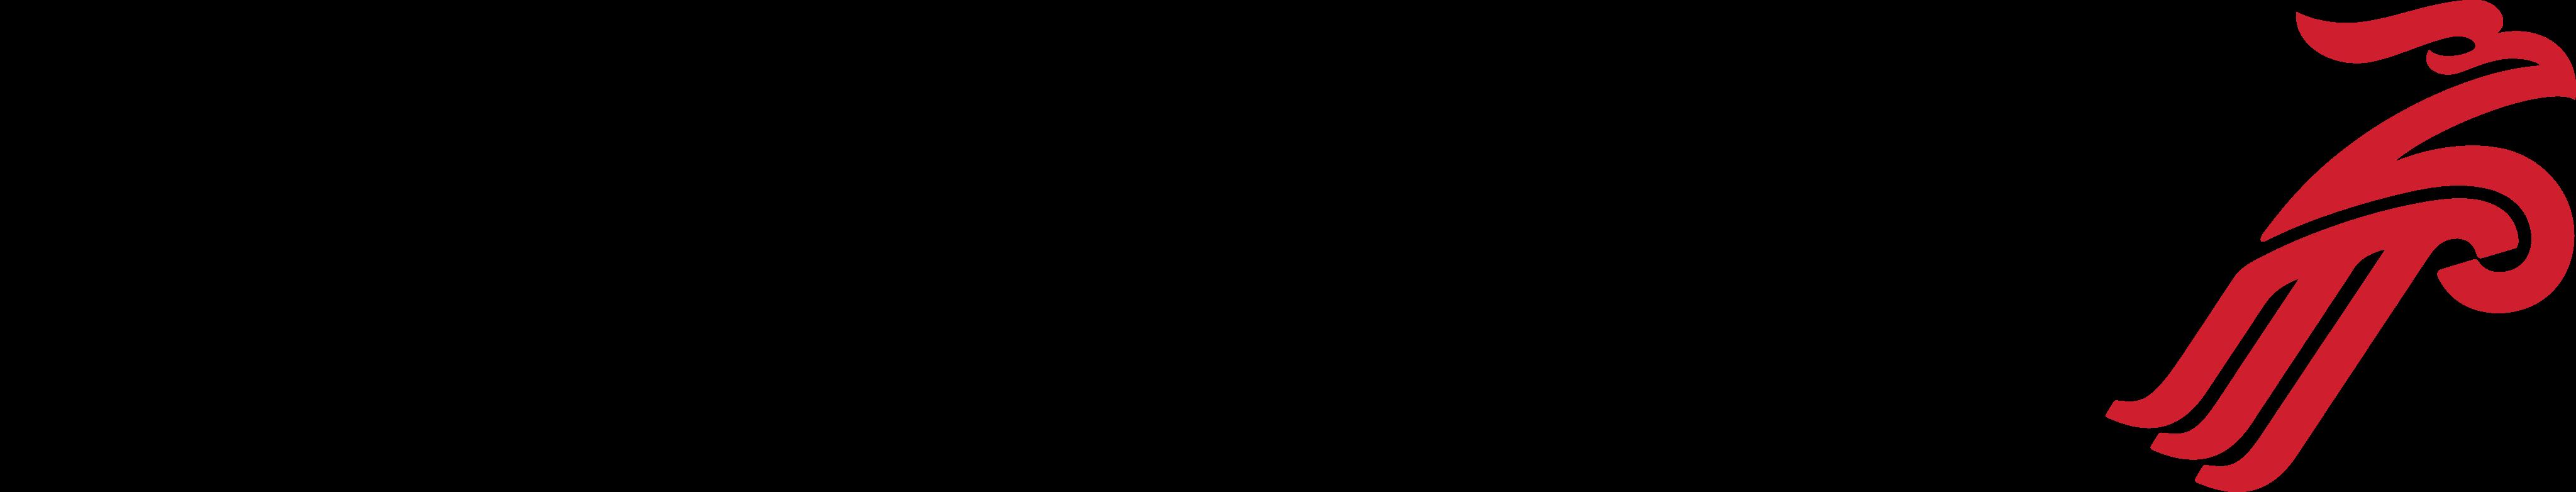 shenzhen airlines logo - Shenzhen Airlines Logo